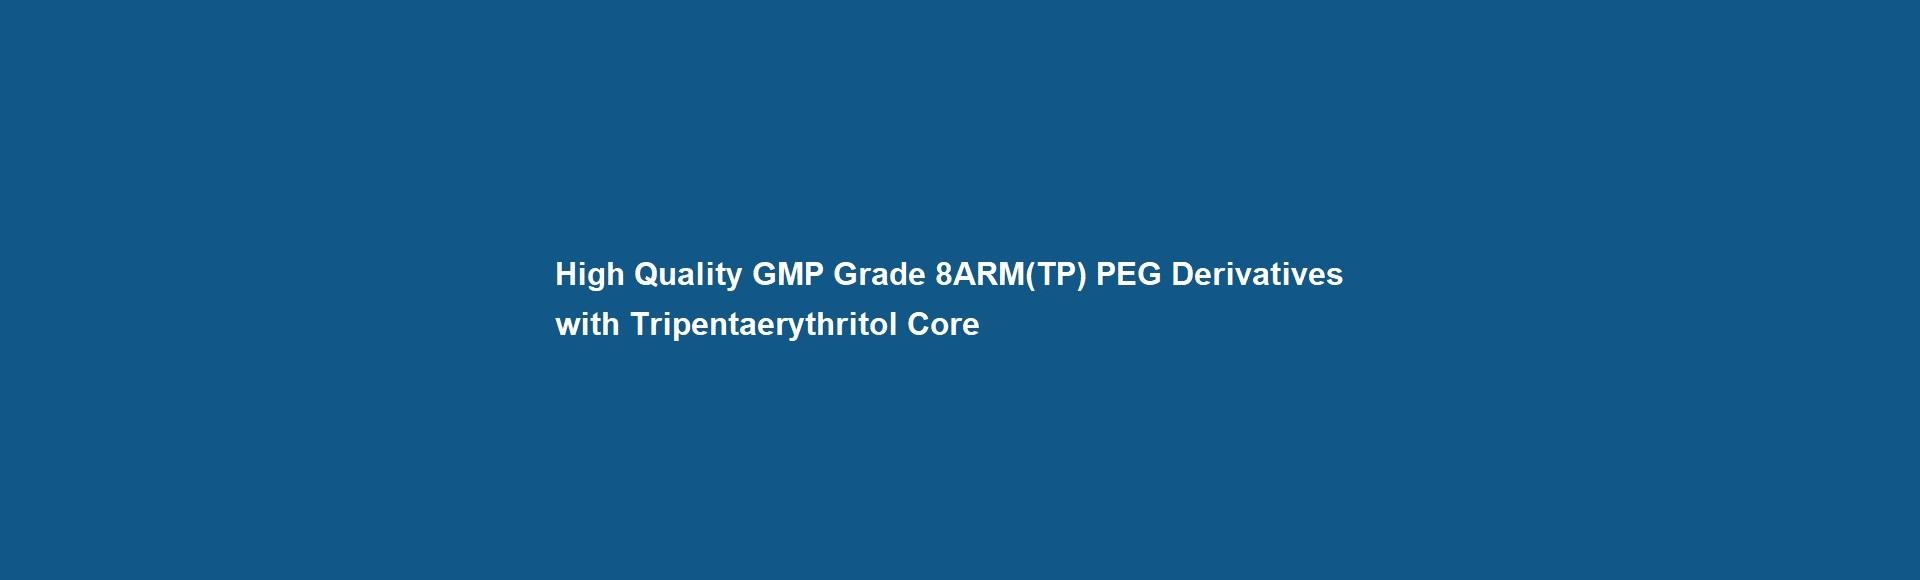 High Purity 8ARM PEG Tripentaerythritol Core